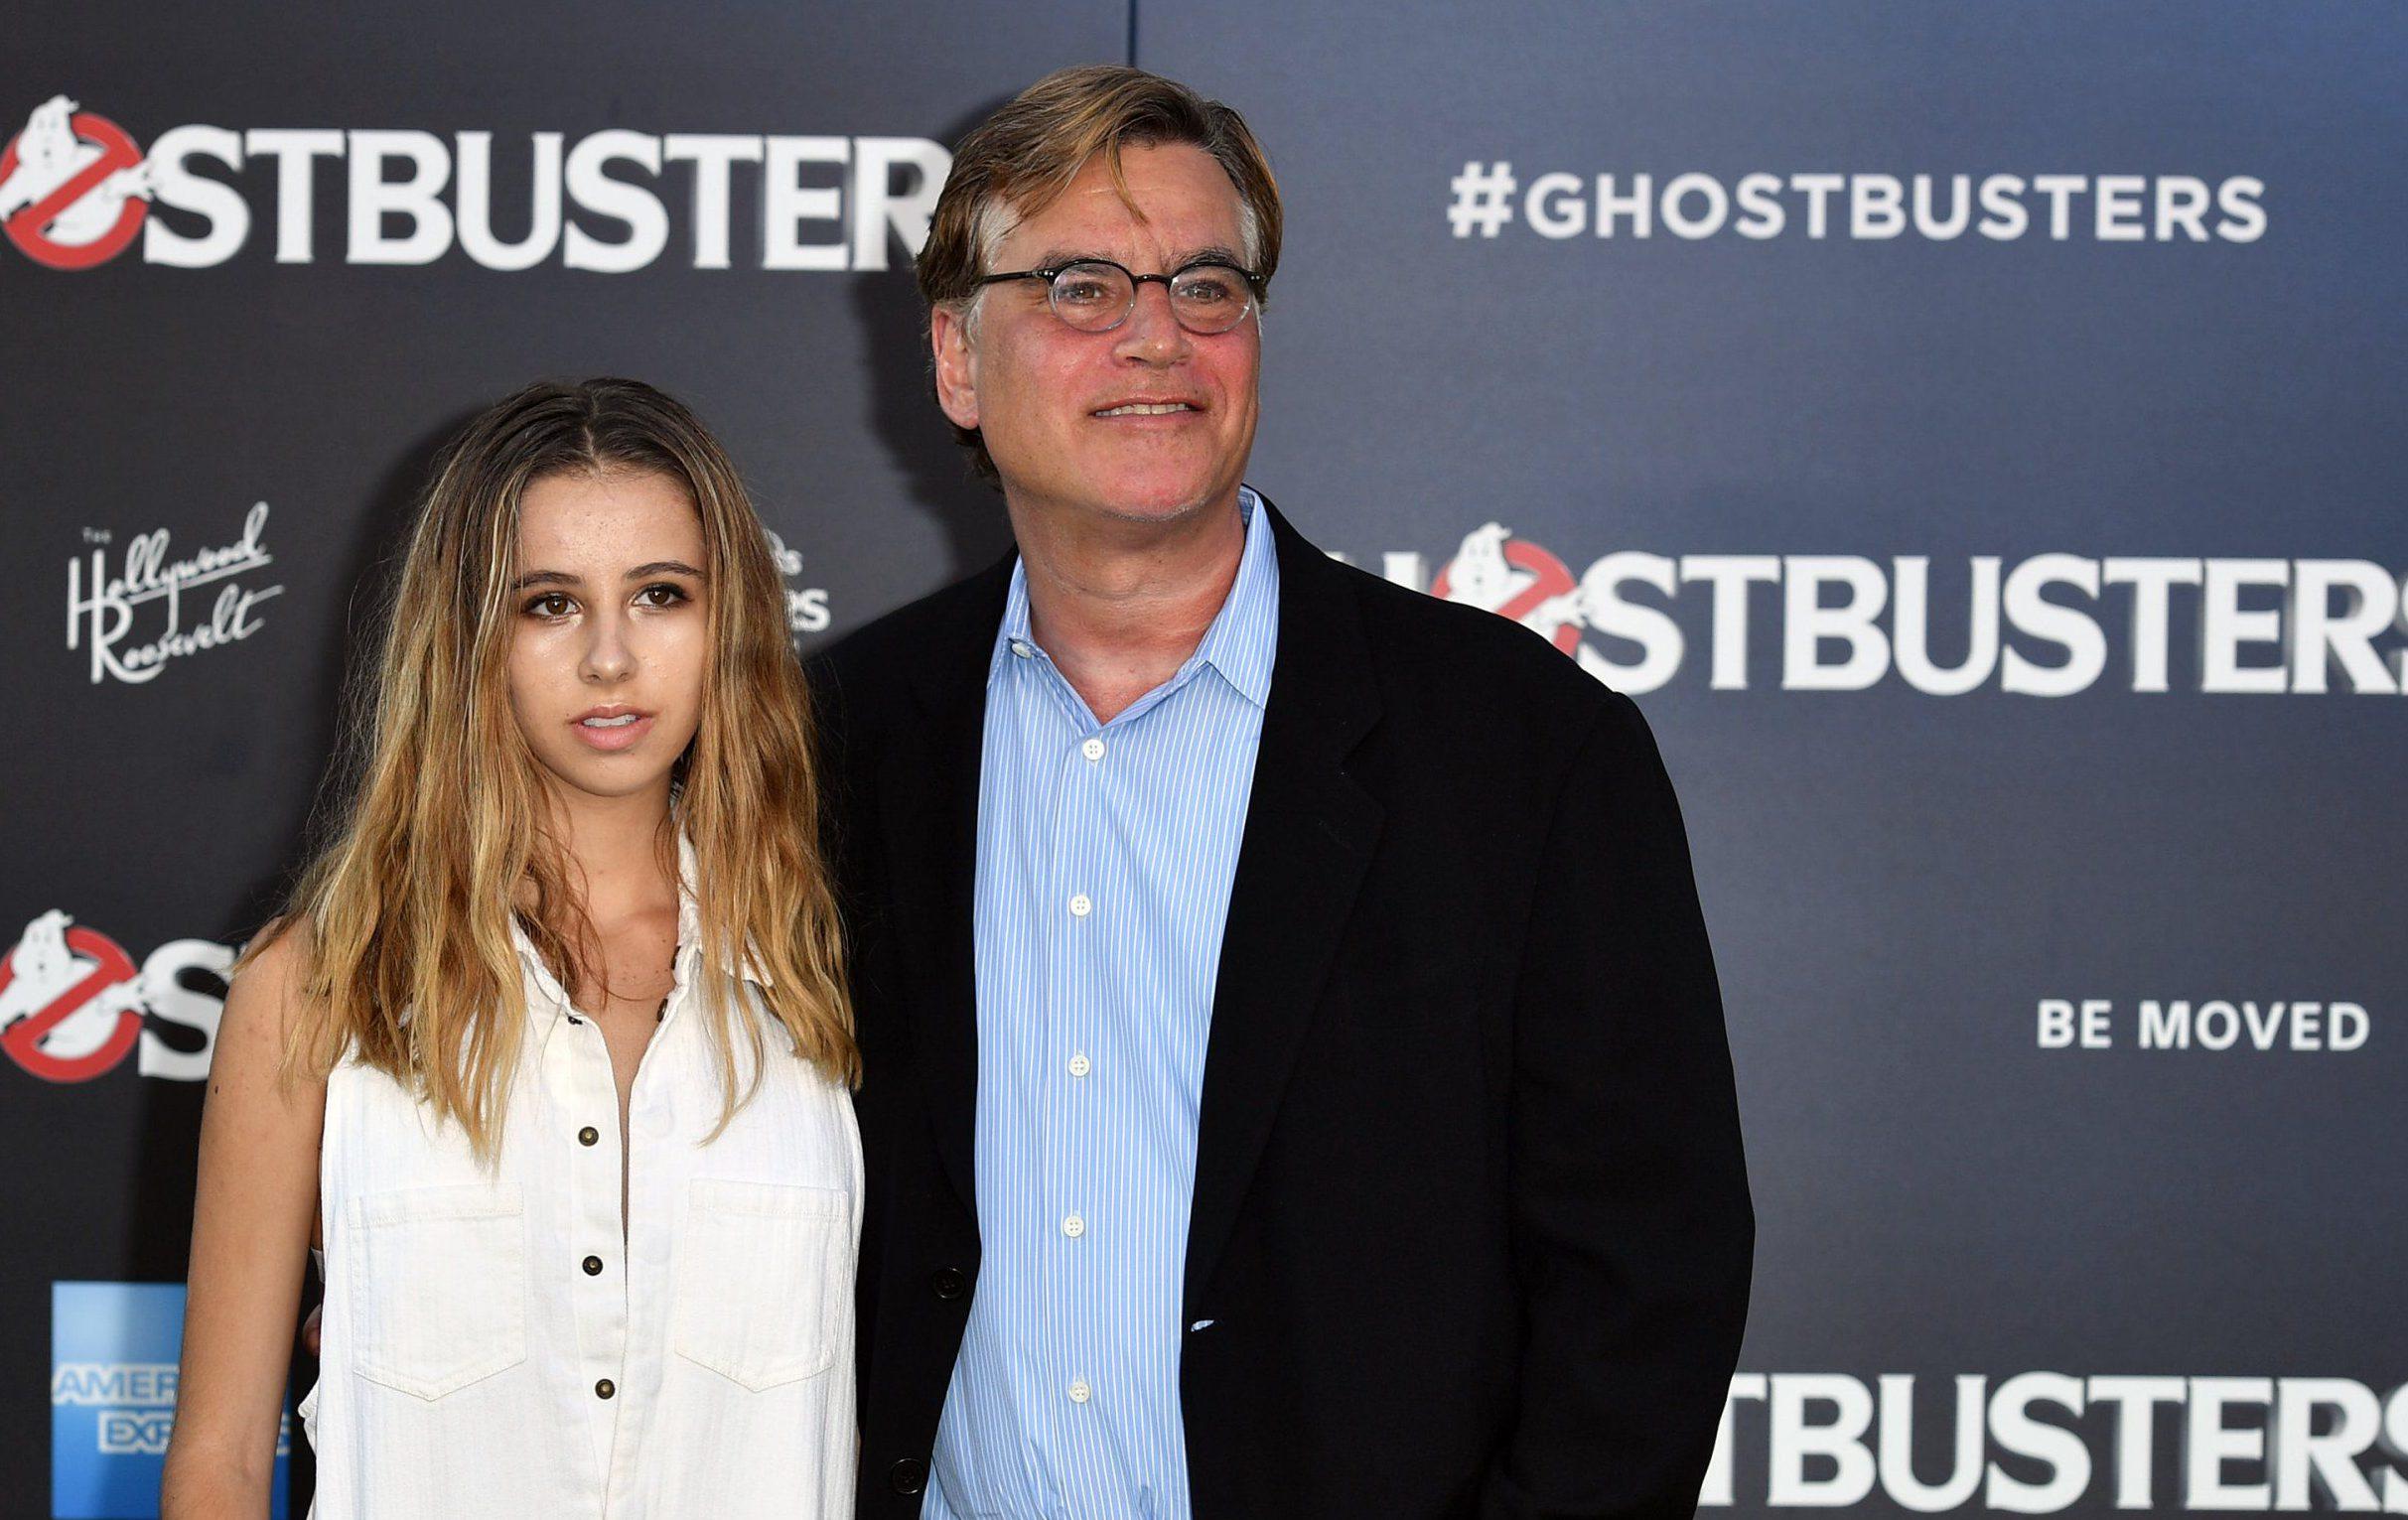 Mandatory Credit: Photo by Rob Latour/REX/Shutterstock (5754119bx)nAaron Sorkin and Roxy Sorkinn'Ghostbusters' film premiere, Arrivals, Los Angeles, USA - 09 Jul 2016nn